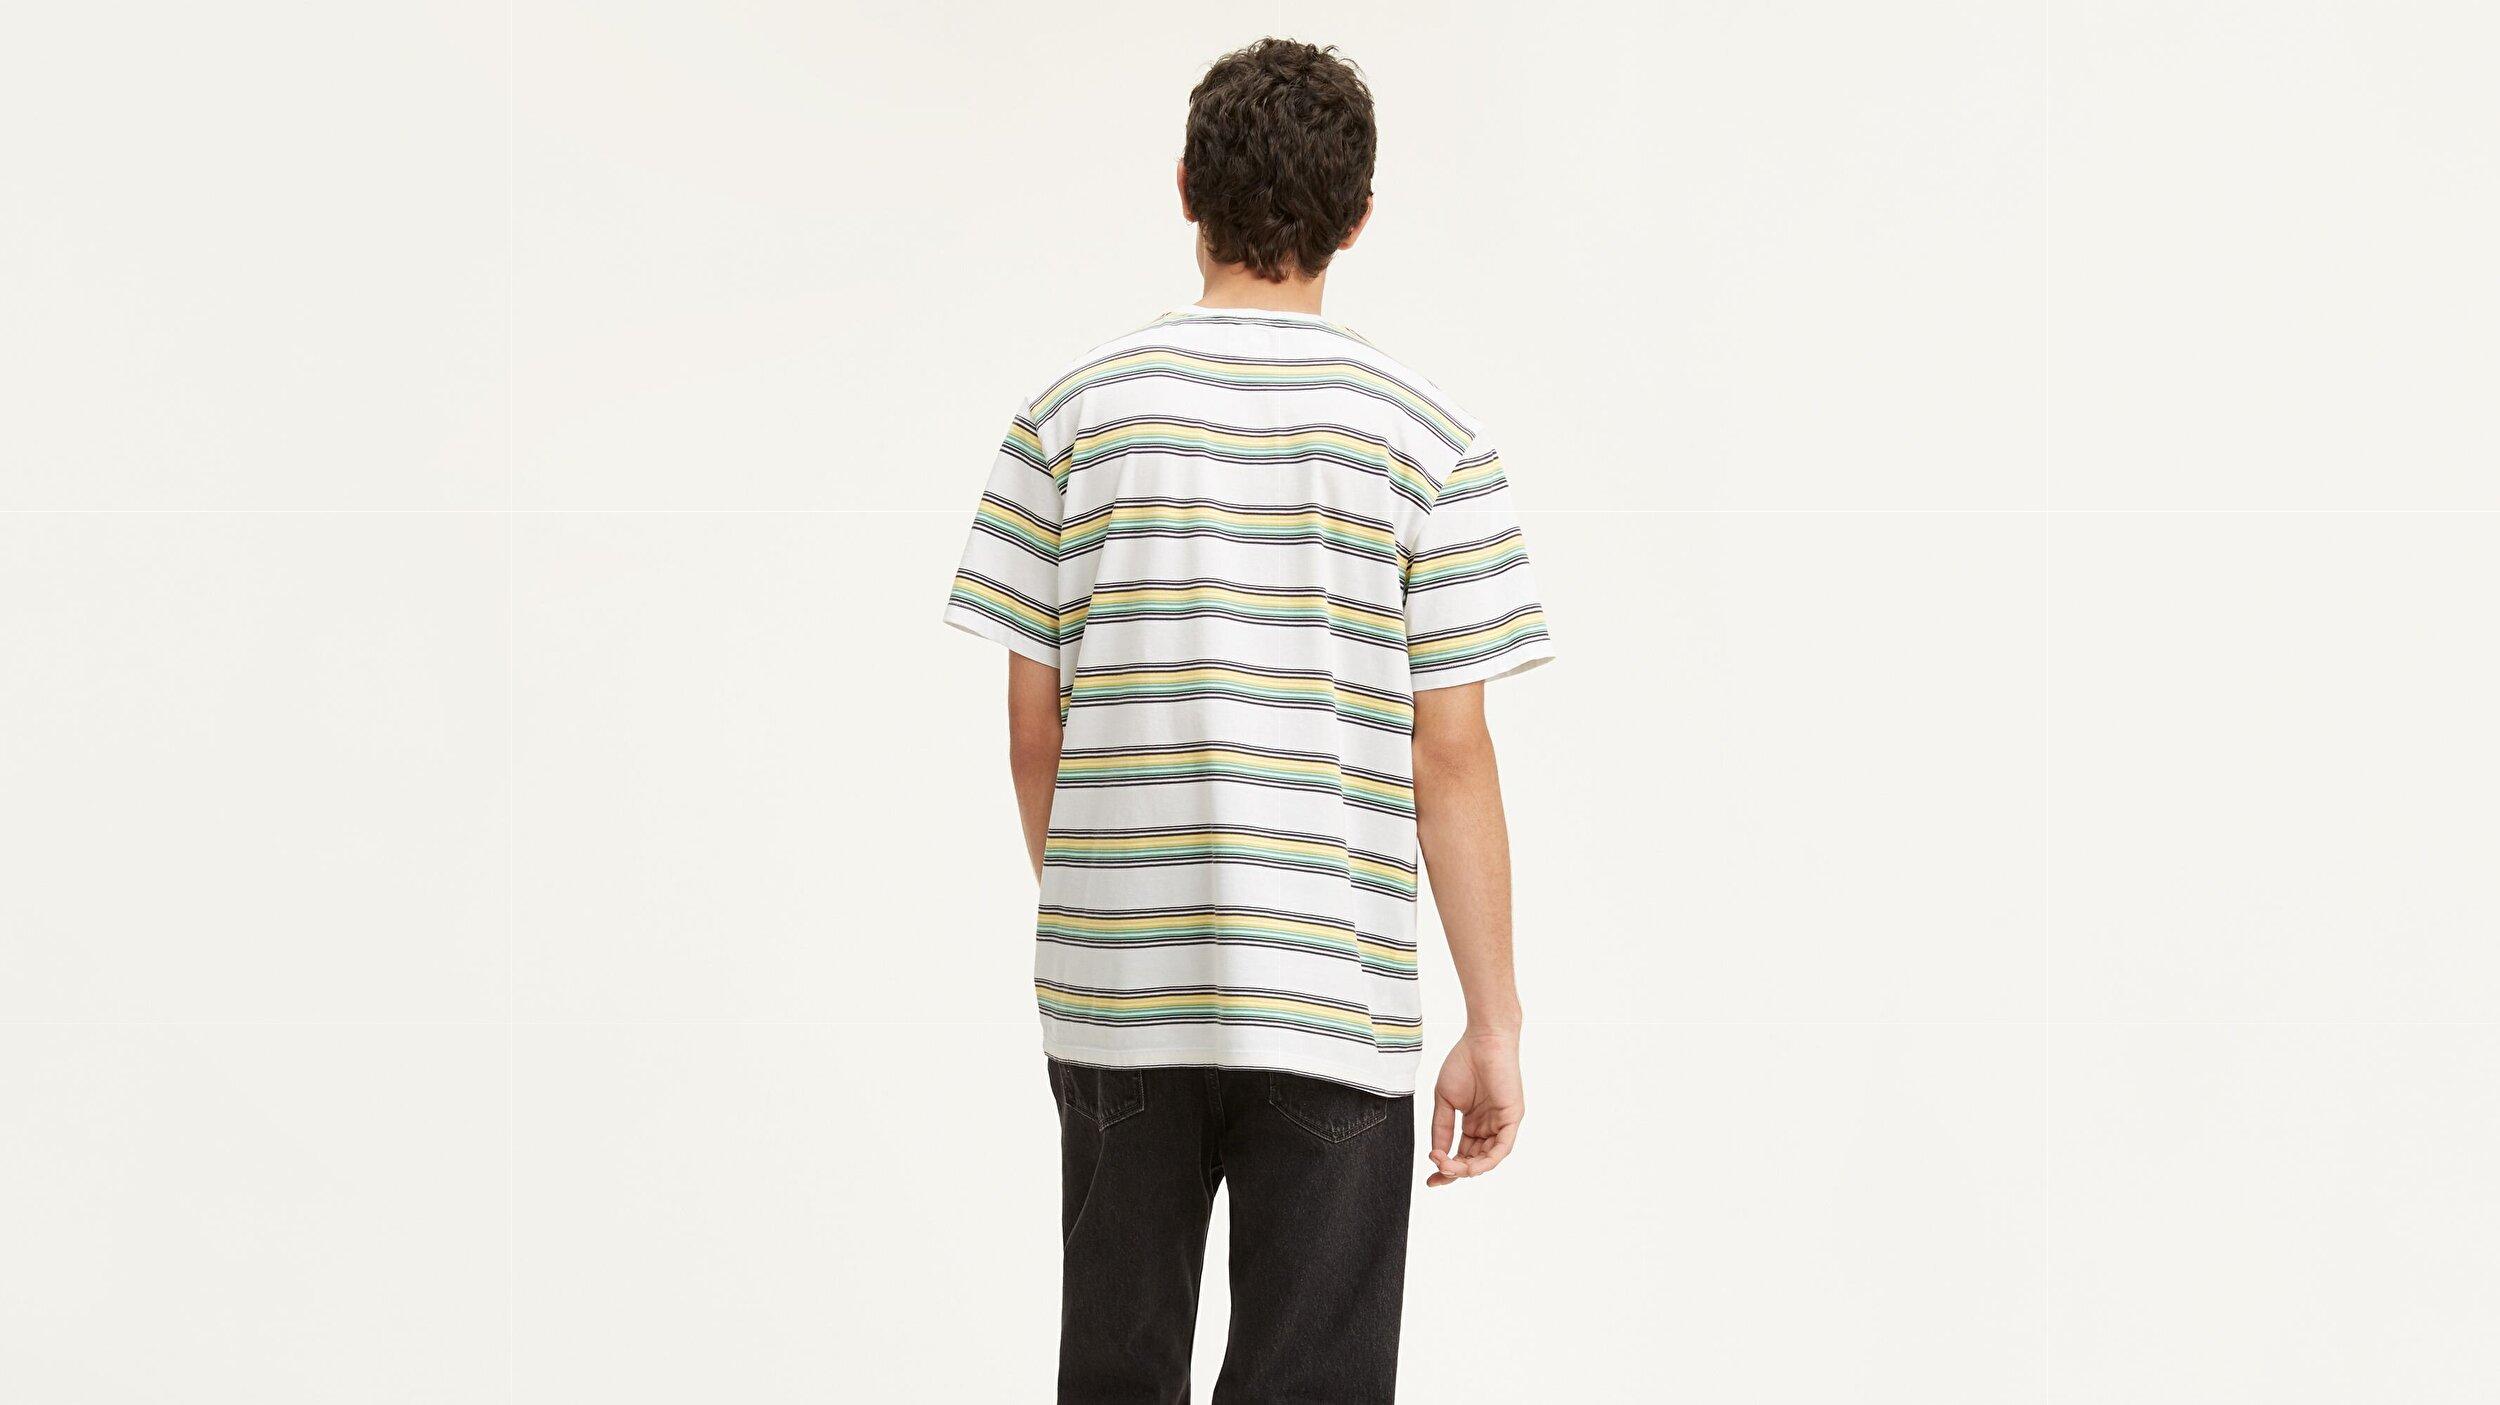 Ss Set-In Sunset Pocket Ss Sunset Çok renkli Erkek Tişört